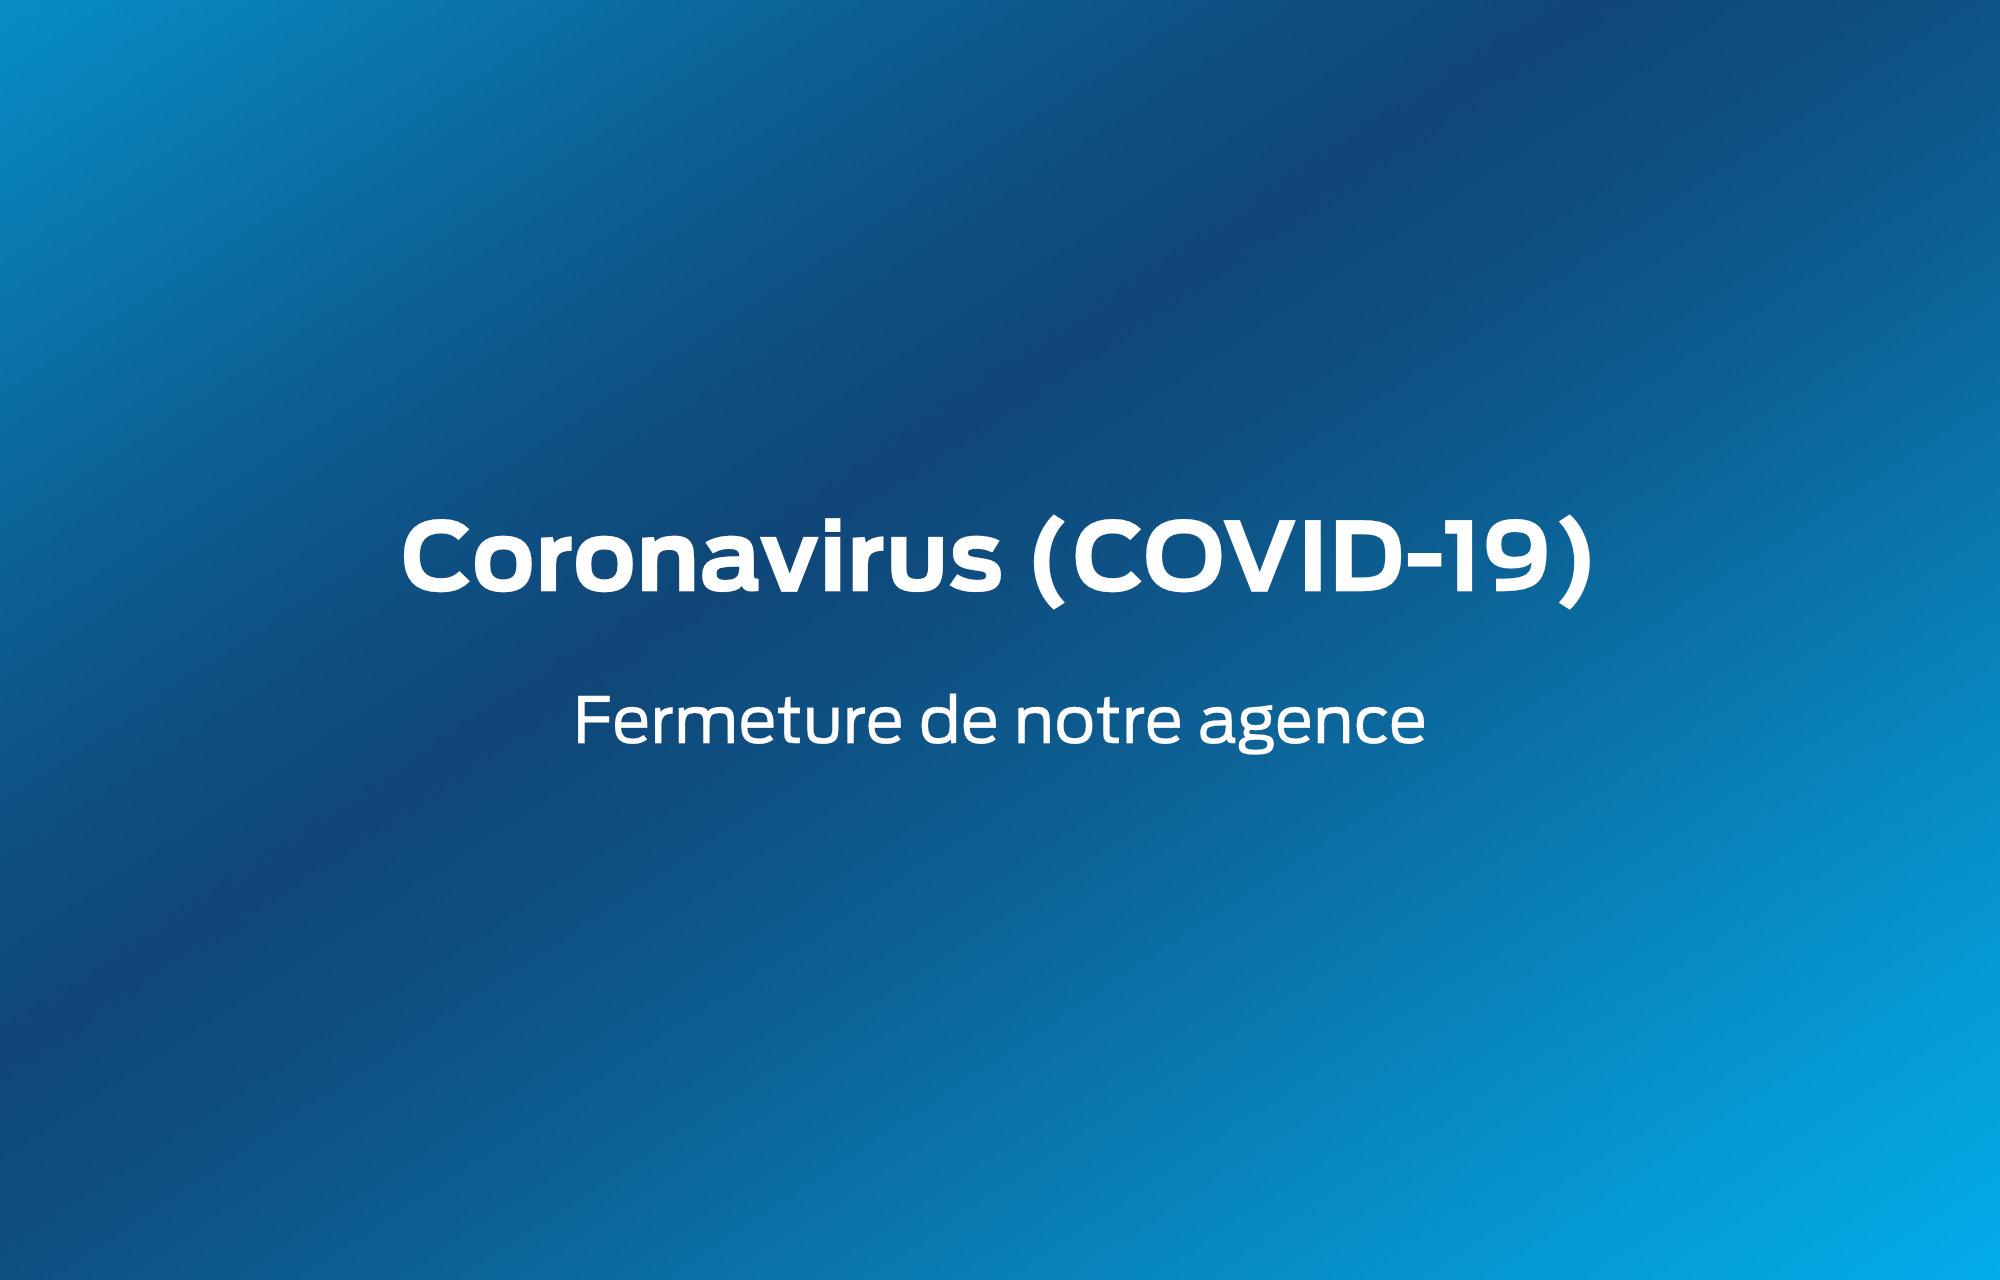 **Coronavirus** : Fermeture de notre agence